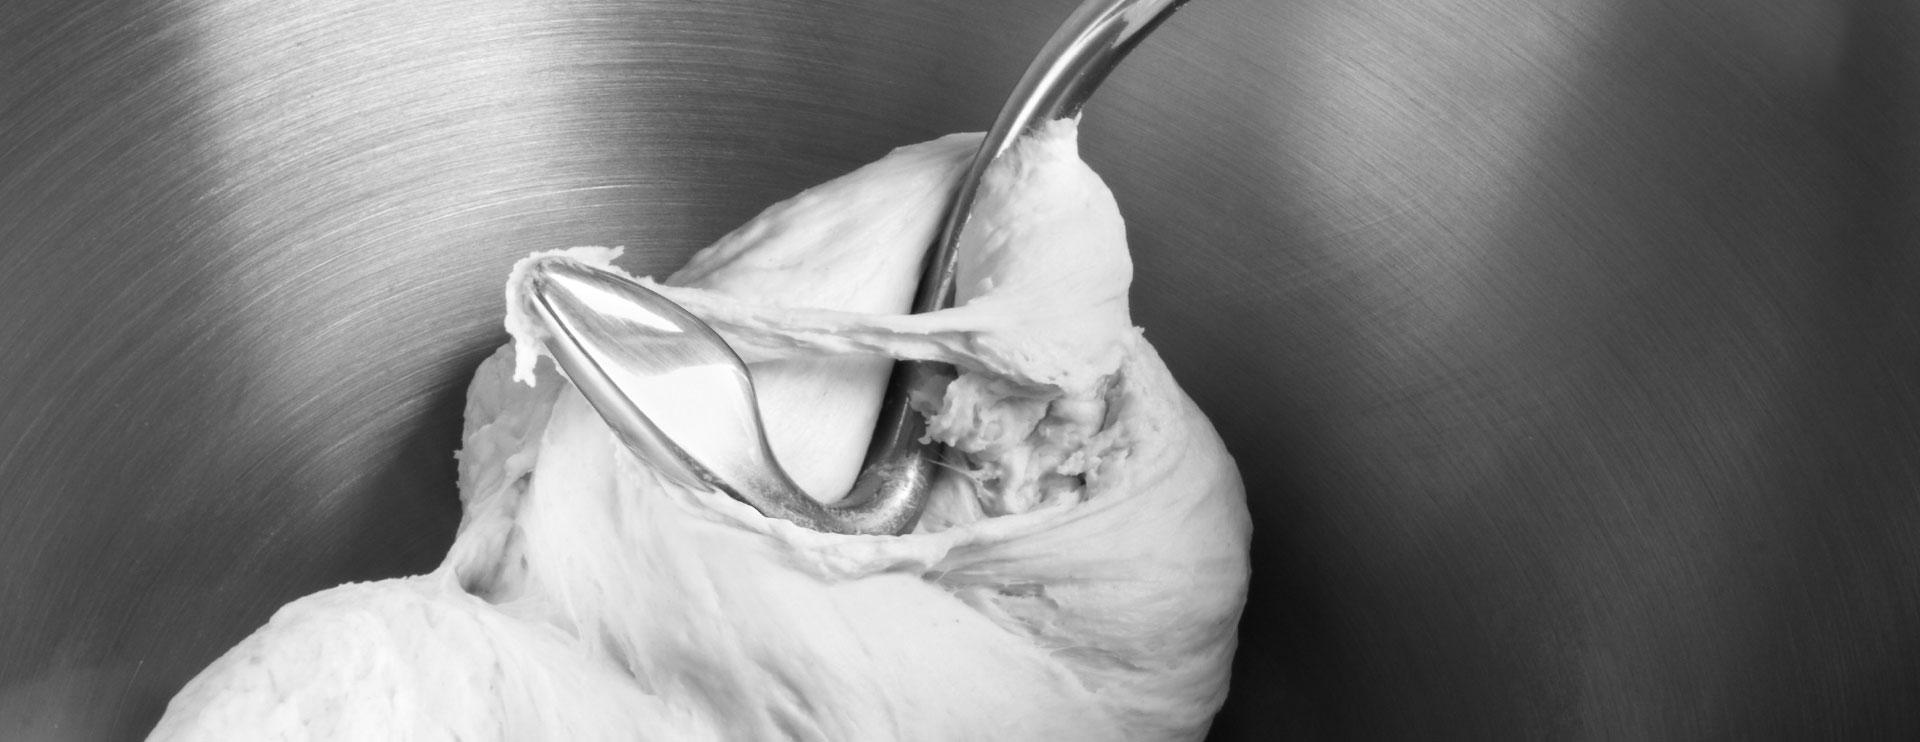 Dough Extraction Belts